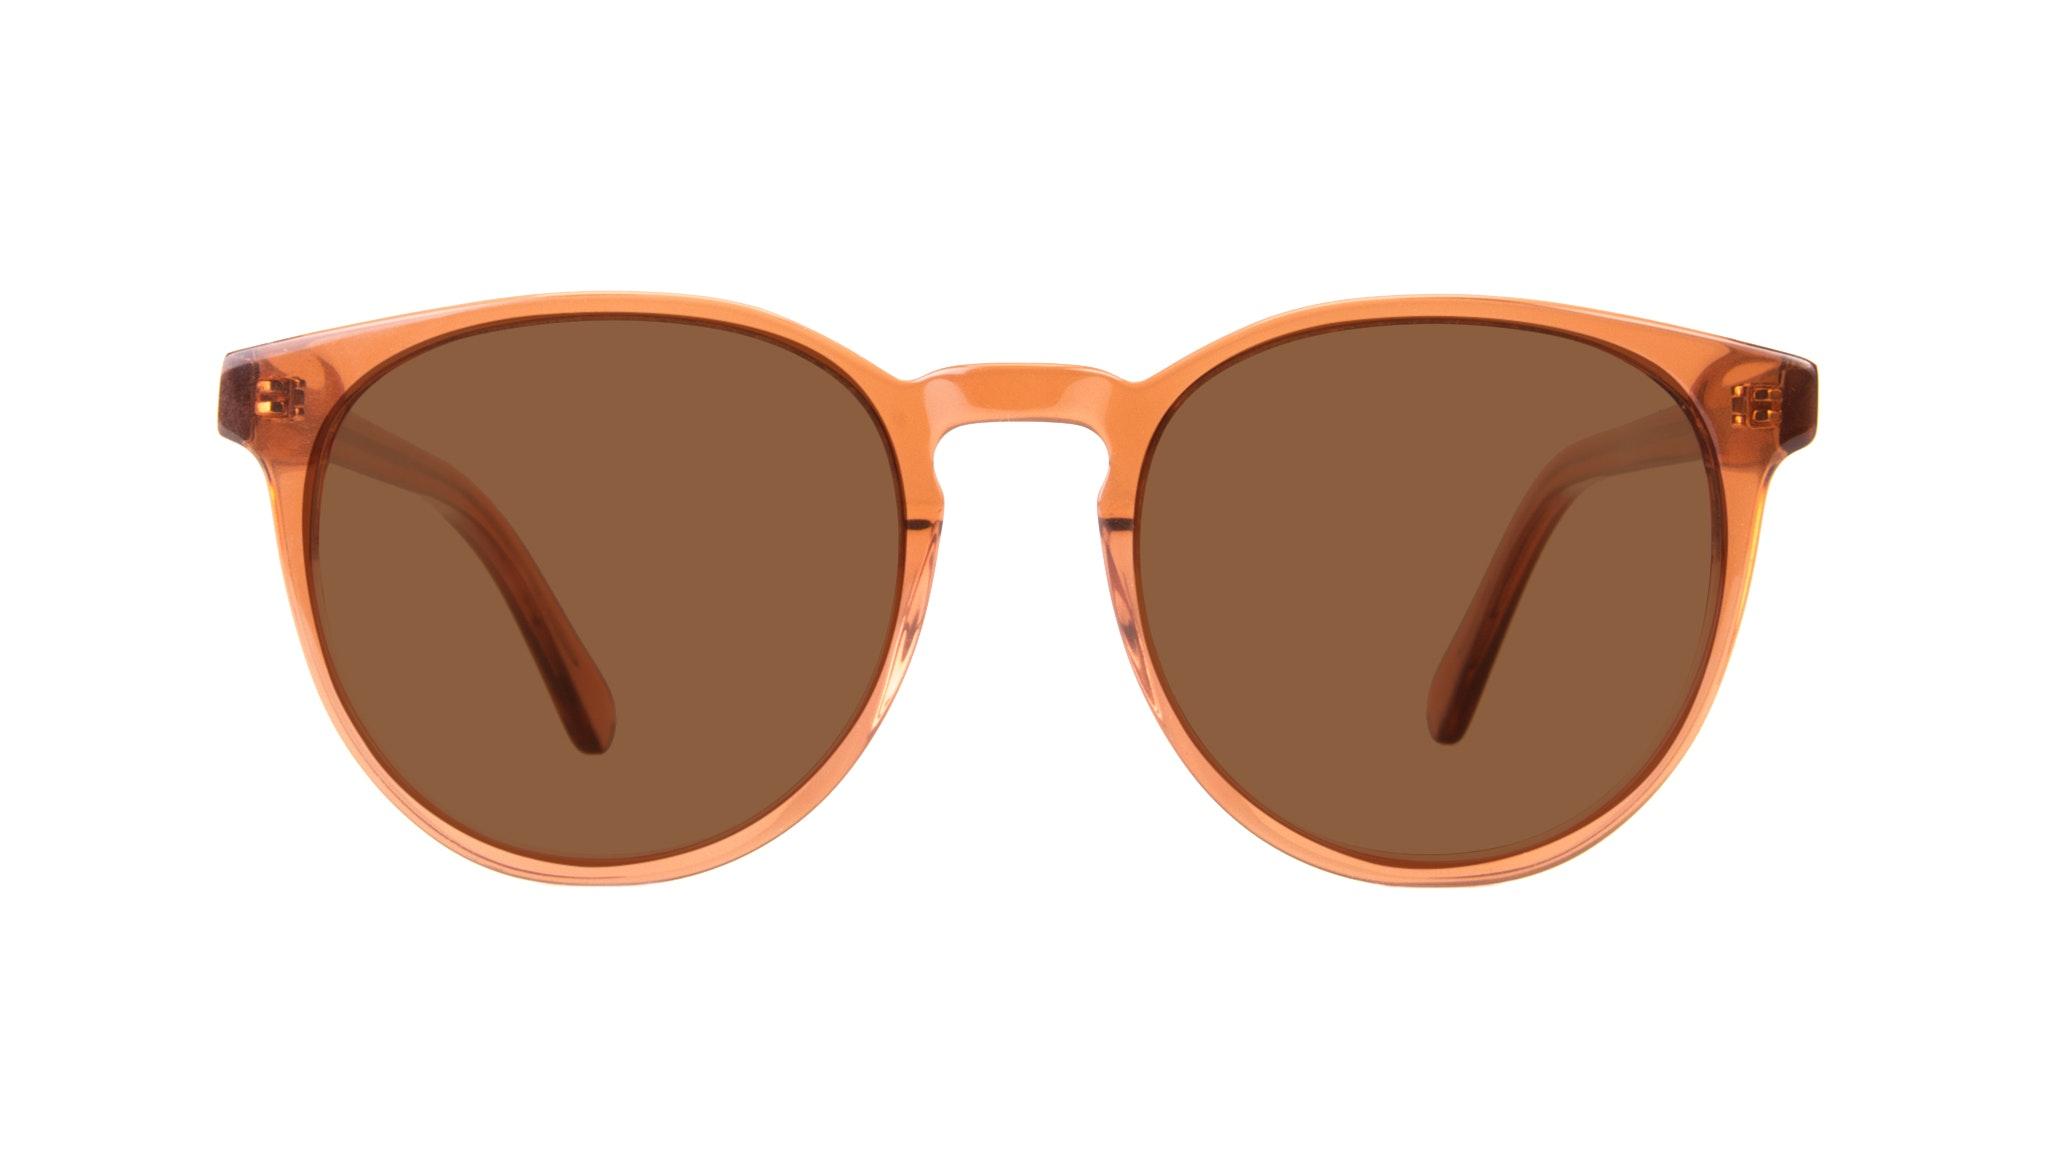 Affordable Fashion Glasses Round Eyeglasses Women Brilliant Umber